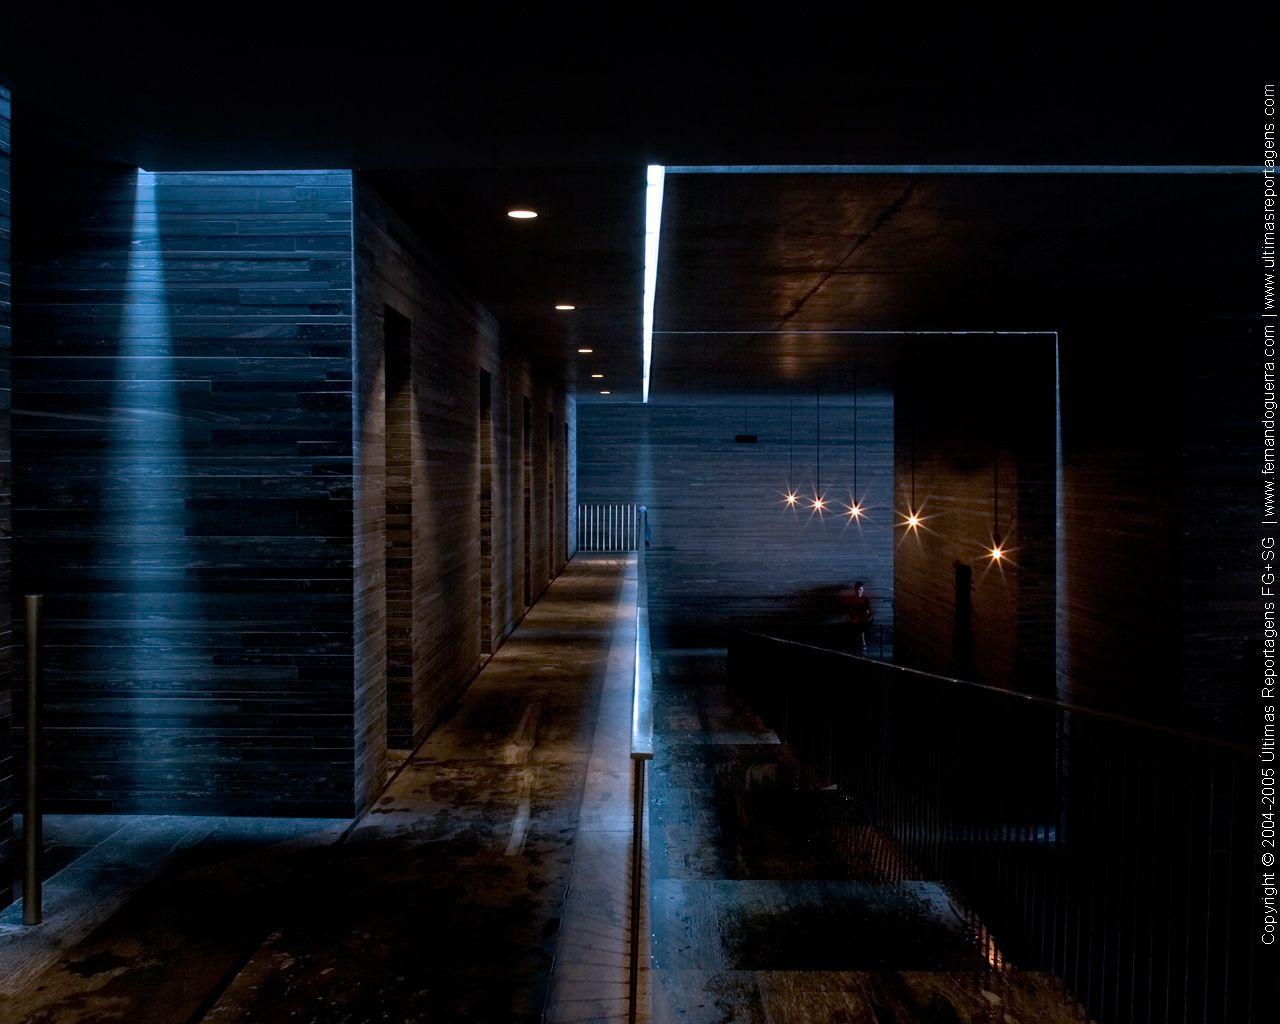 Arquitectura contempor nea peter zumthor for Arquitectura contemporanea